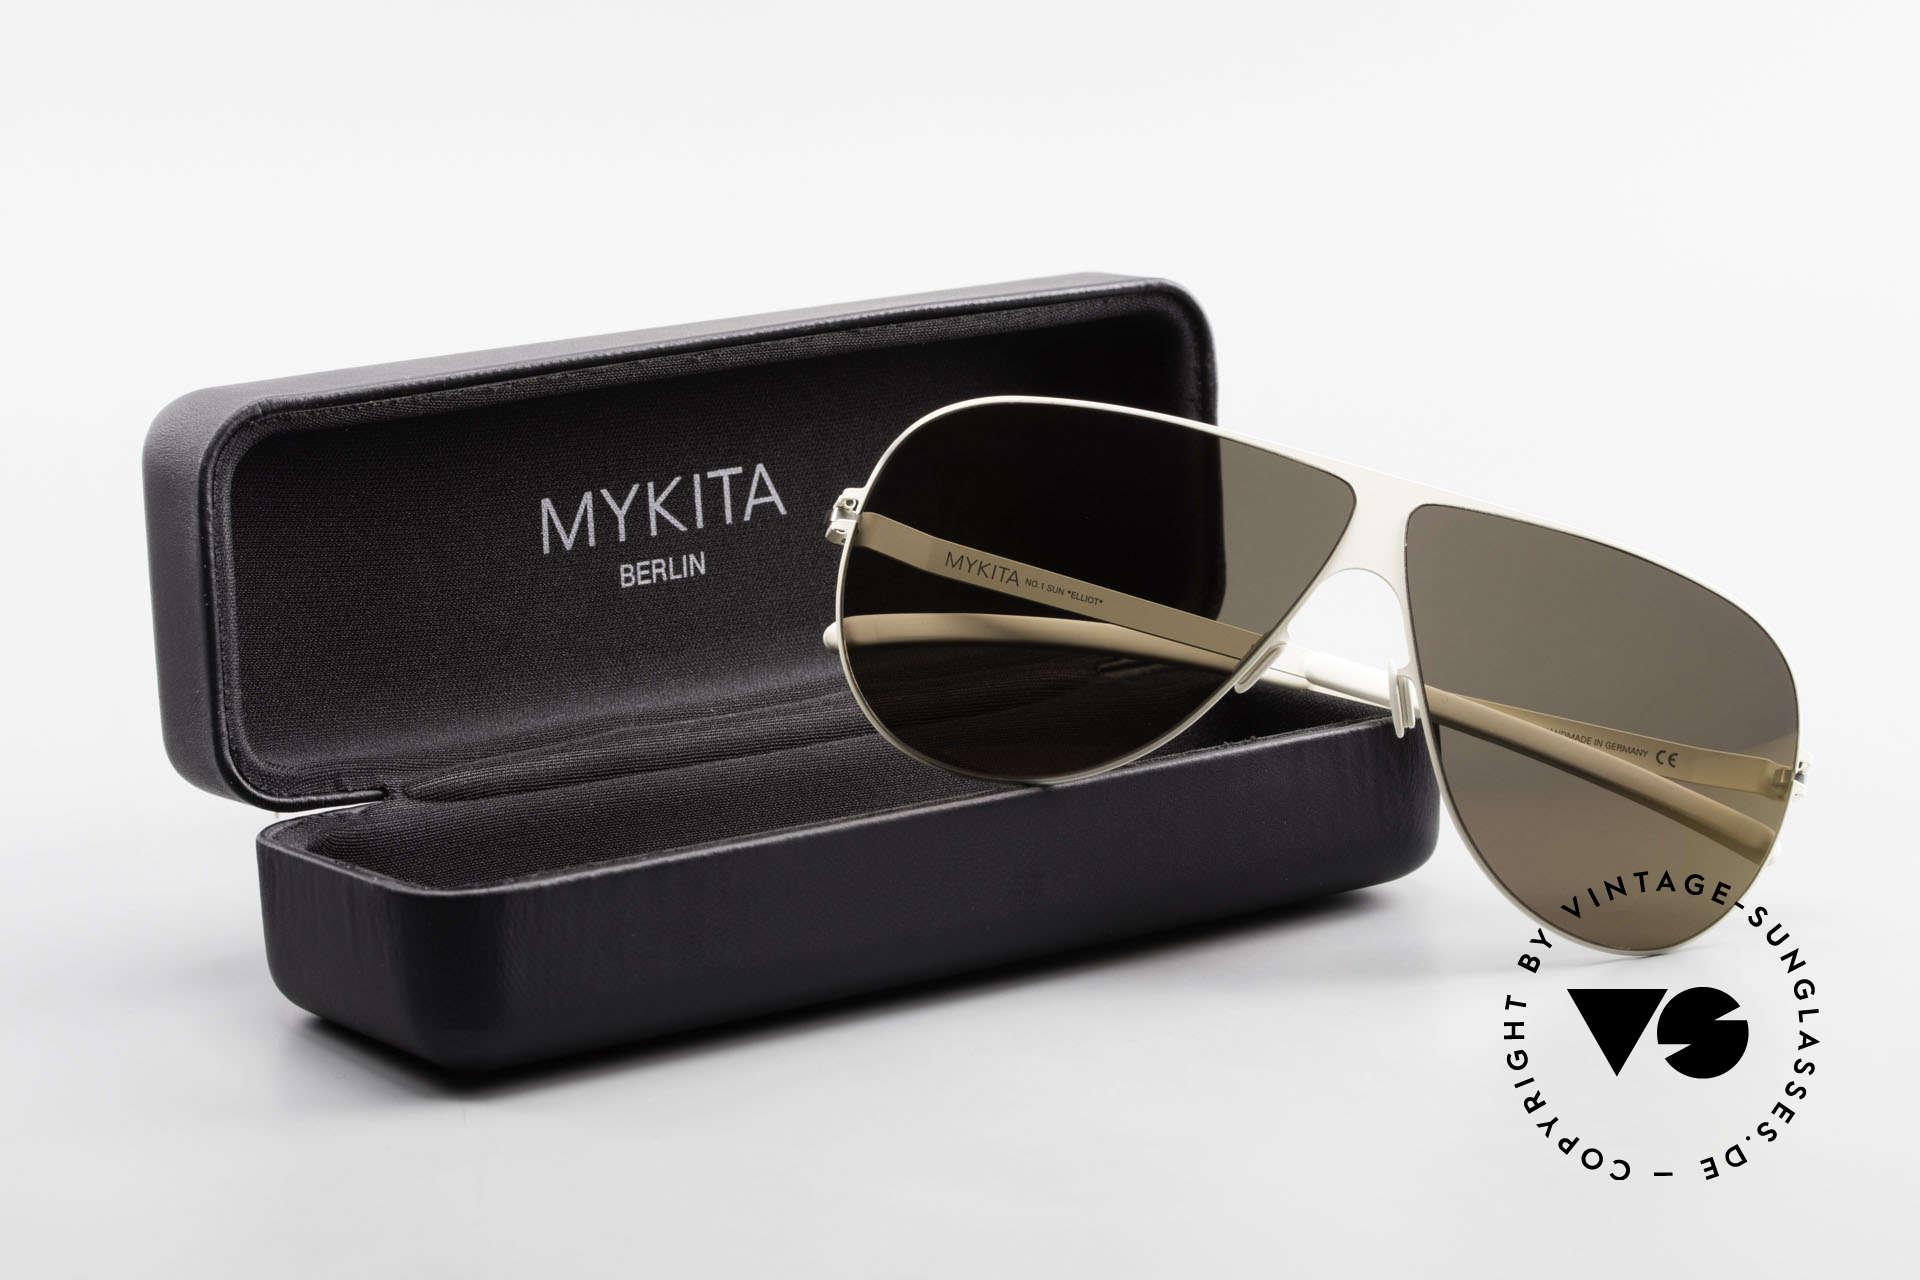 Mykita Elliot Tom Cruise Mykita Sunglasses, Size: medium, Made for Men